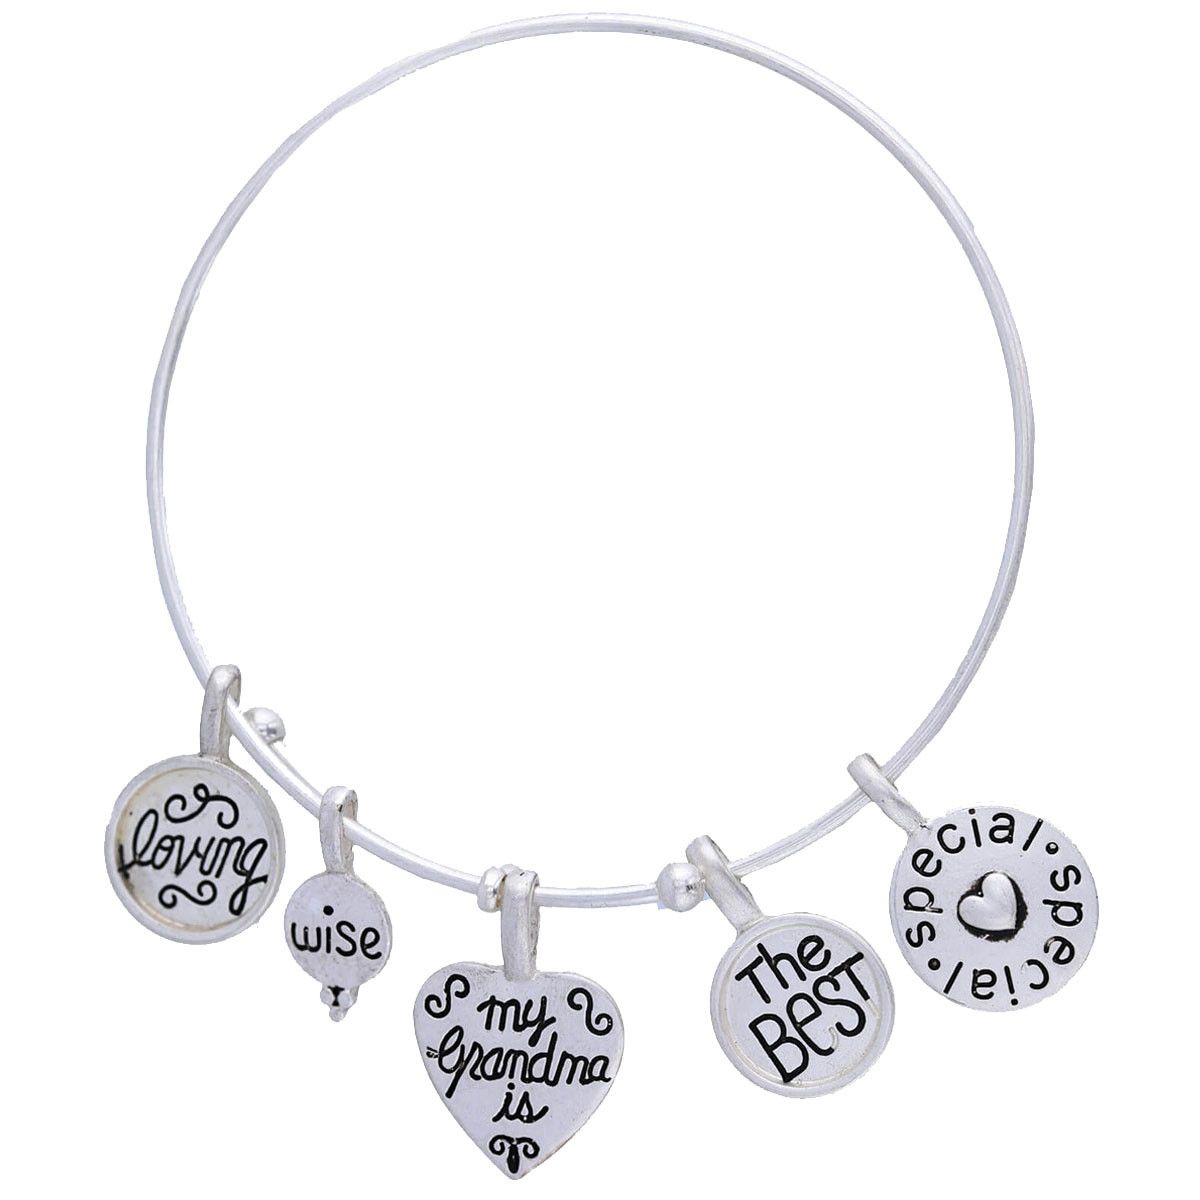 The Best Grandma Wire Charm Bracelet